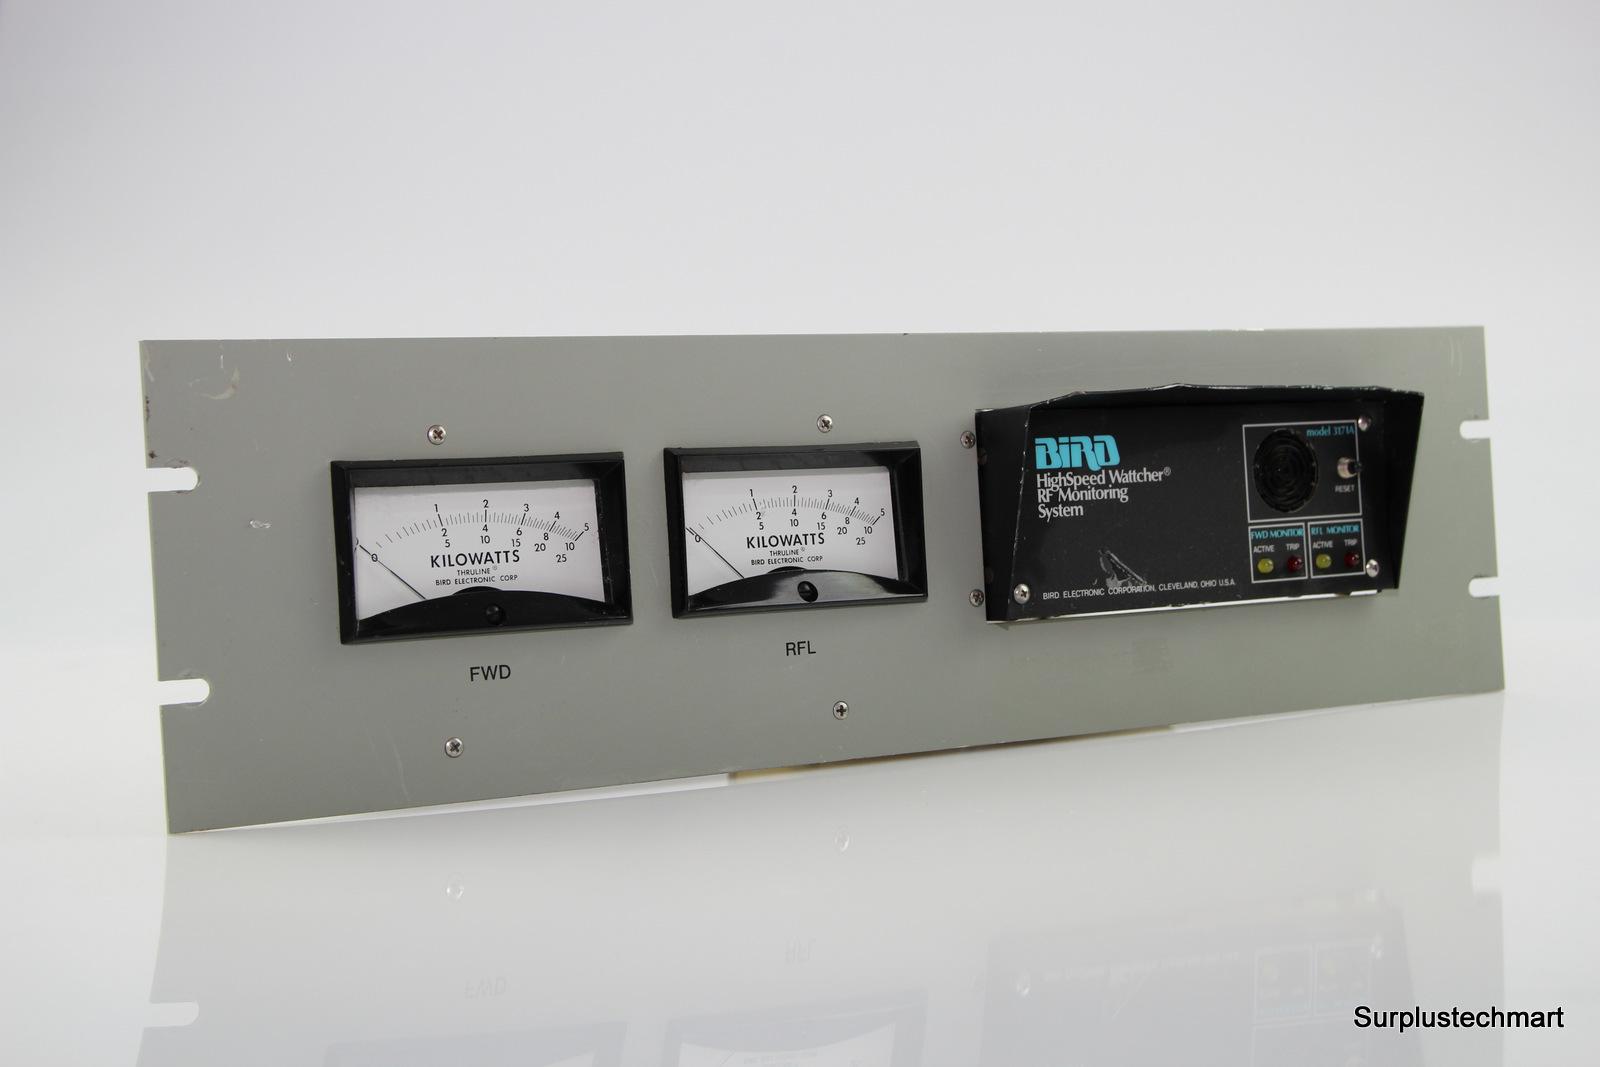 Surplus Electronic Test Equipment : Bird a high speed wattcher rf power meter monitoring